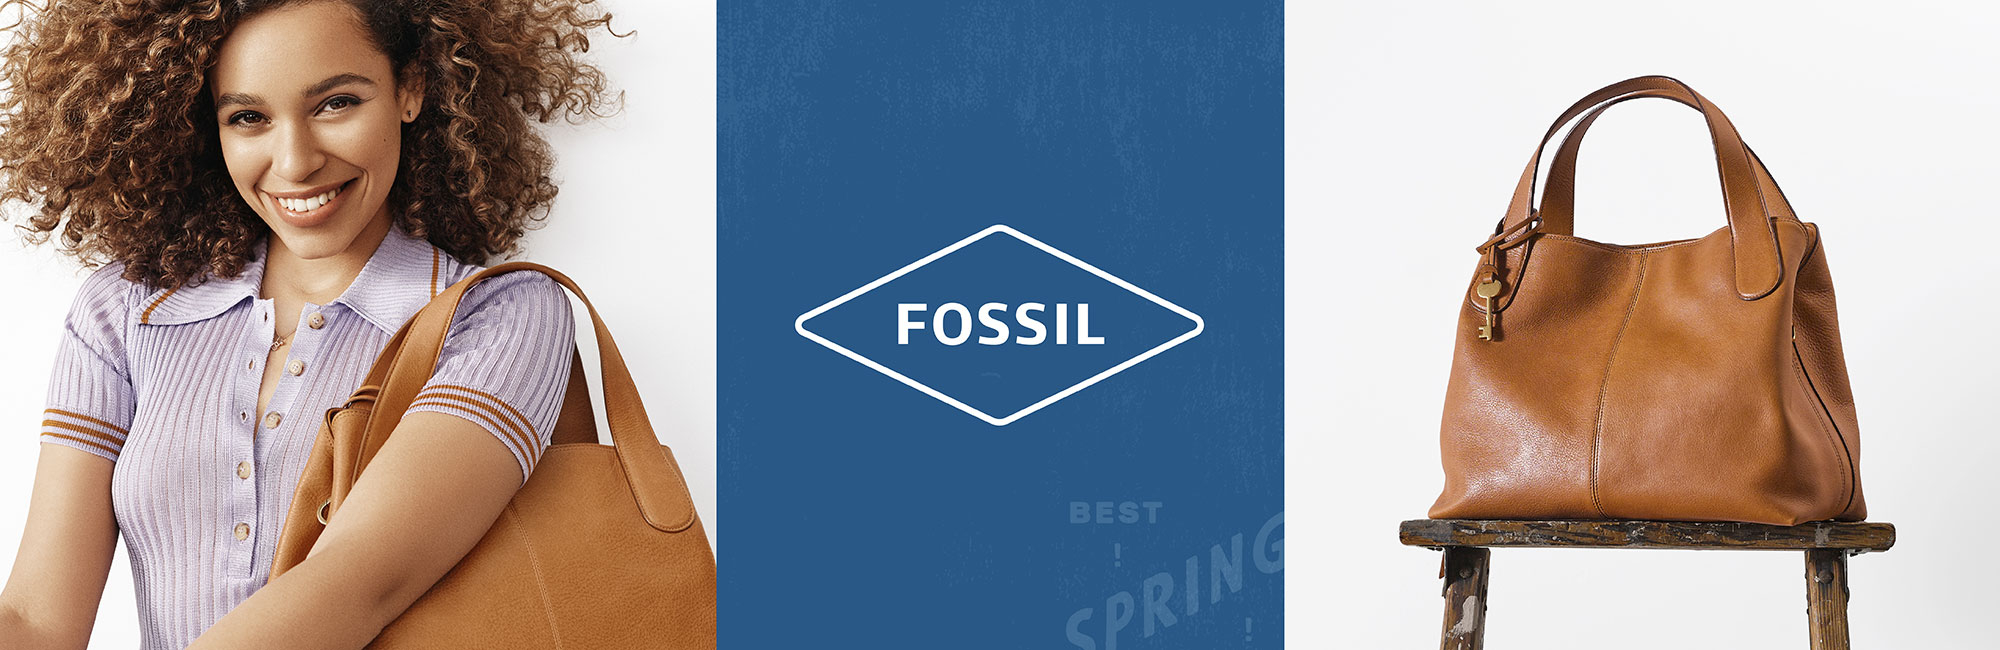 b081be2cf5f Fossil Tassen, Portemonnees en Schoudertassen | wardow.com